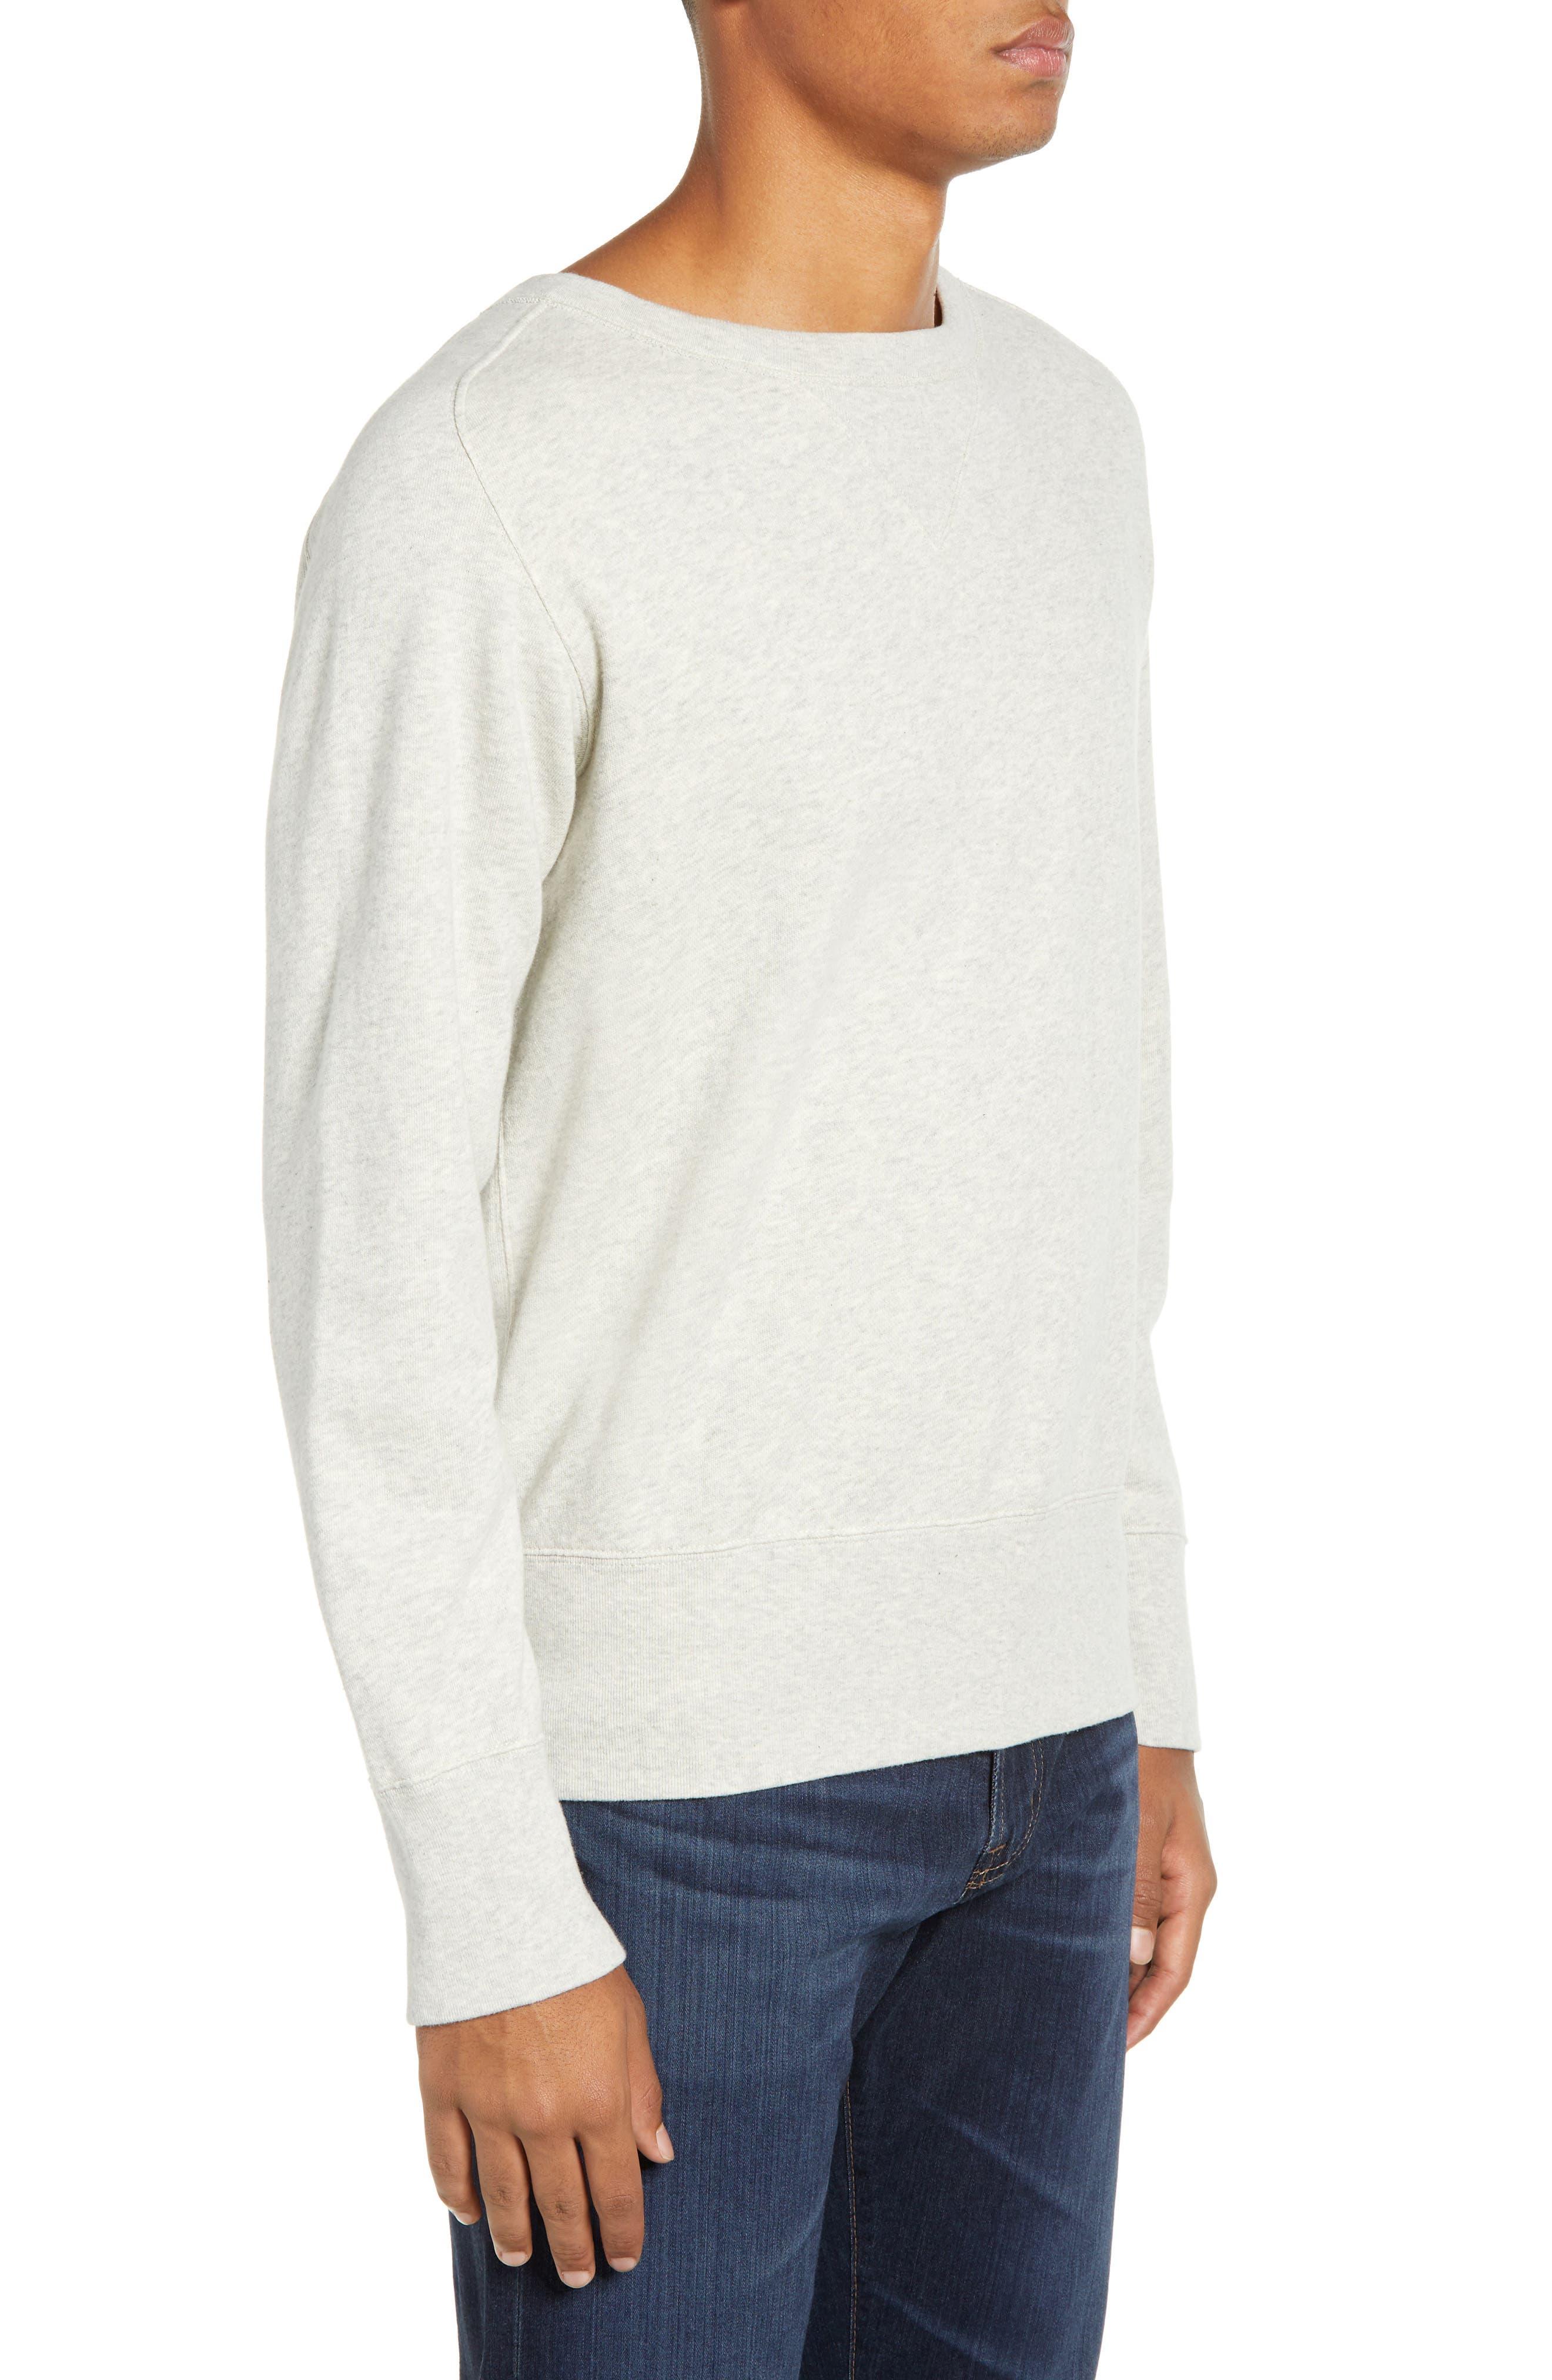 LEVI'S<SUP>®</SUP> VINTAGE CLOTHING, 1930s Bay Meadows Sweatshirt, Alternate thumbnail 3, color, OATMEAL